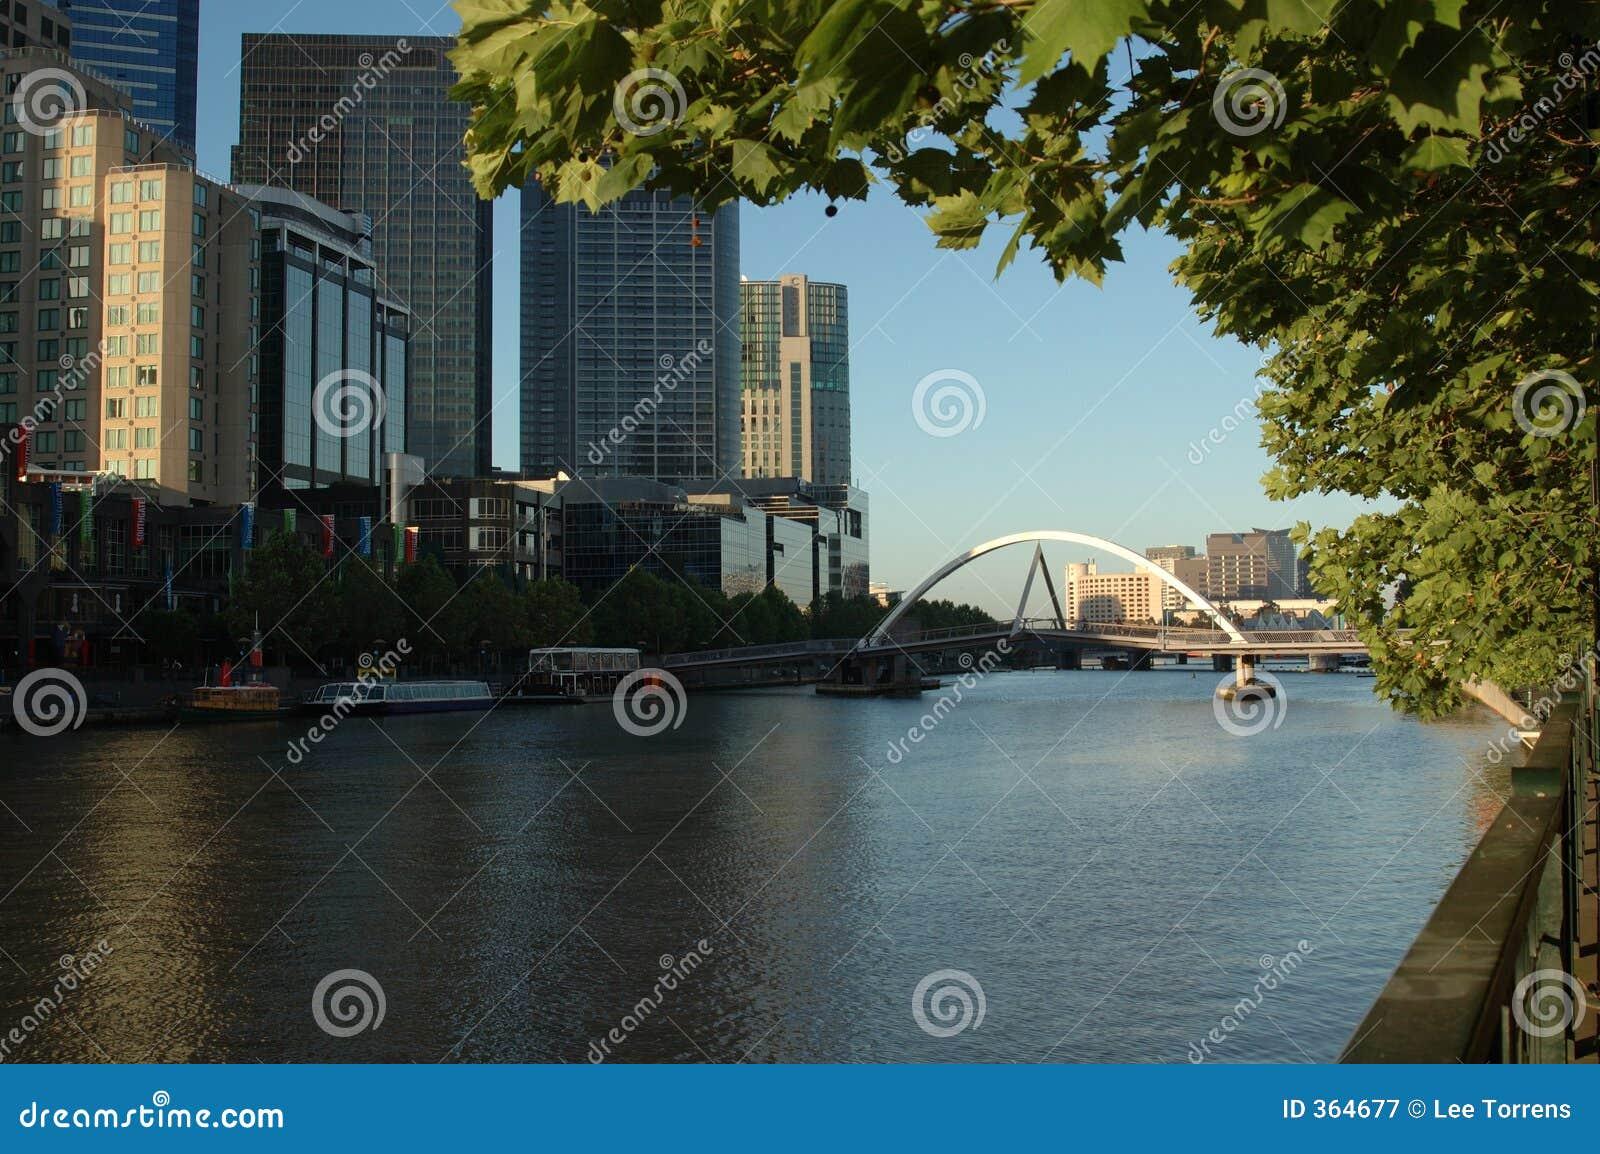 墨尔本河s southbank yarra